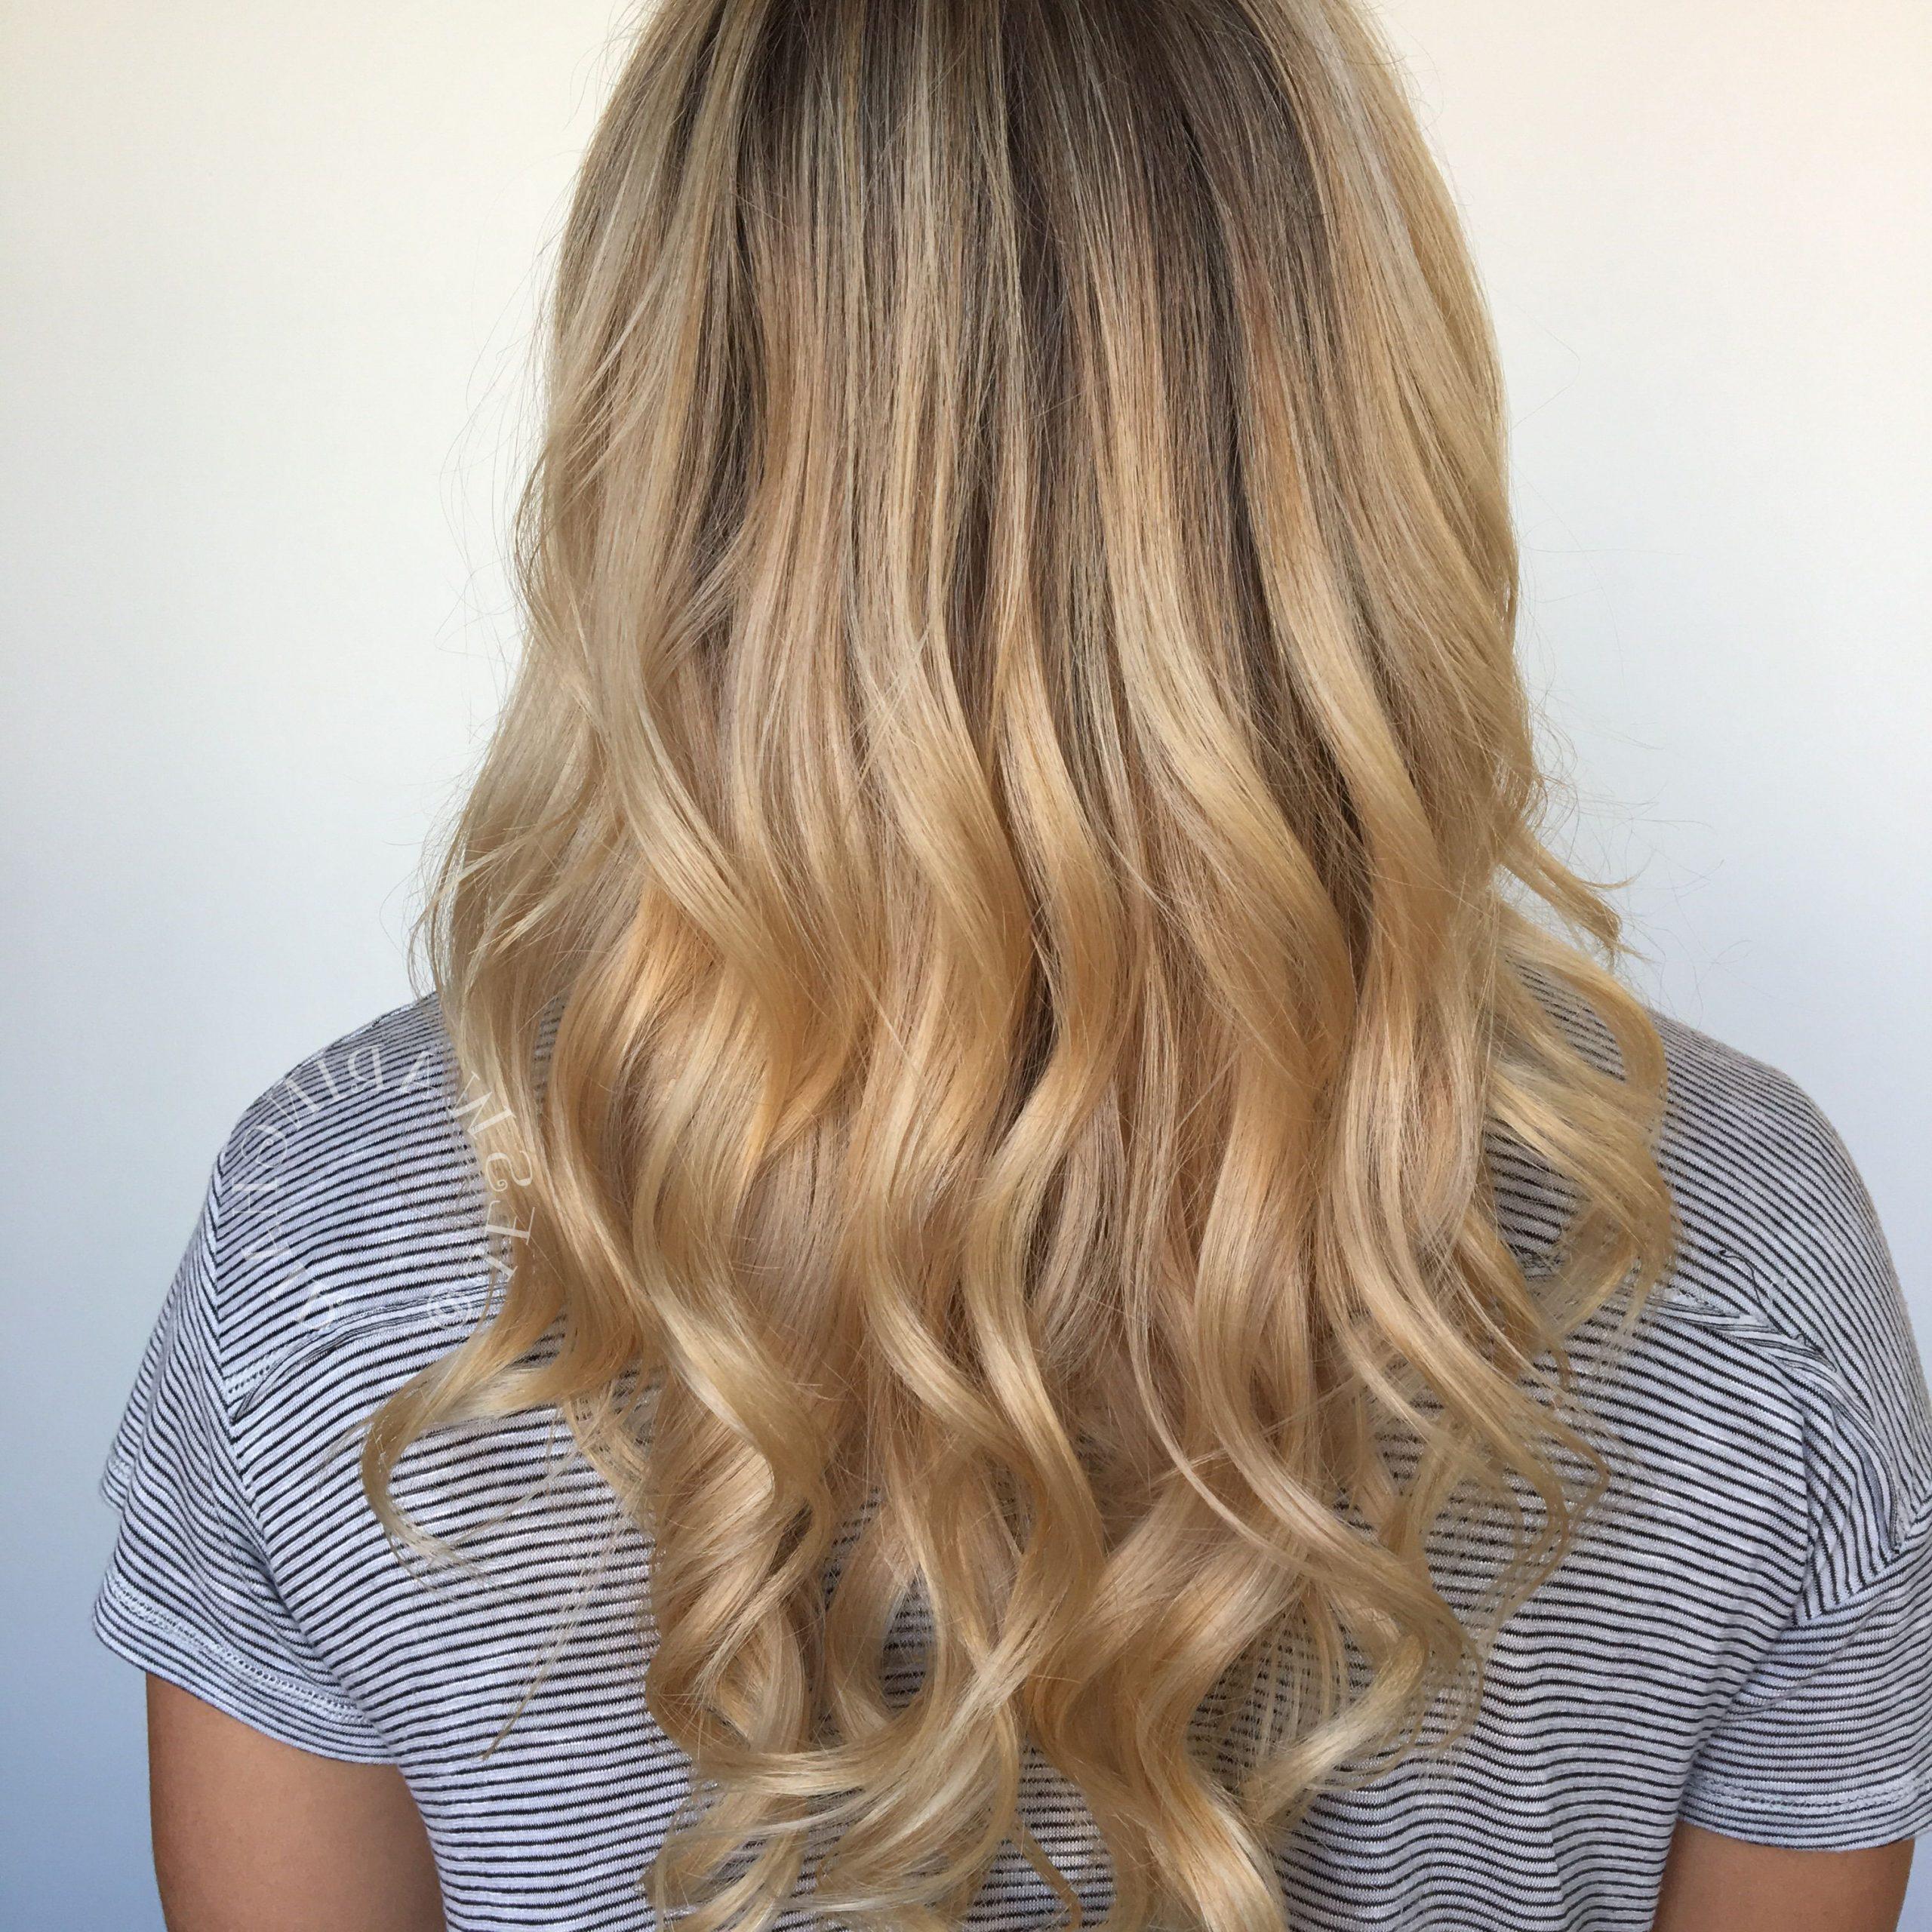 Blonde Balayage, Long Hair Styles (View 13 of 20)